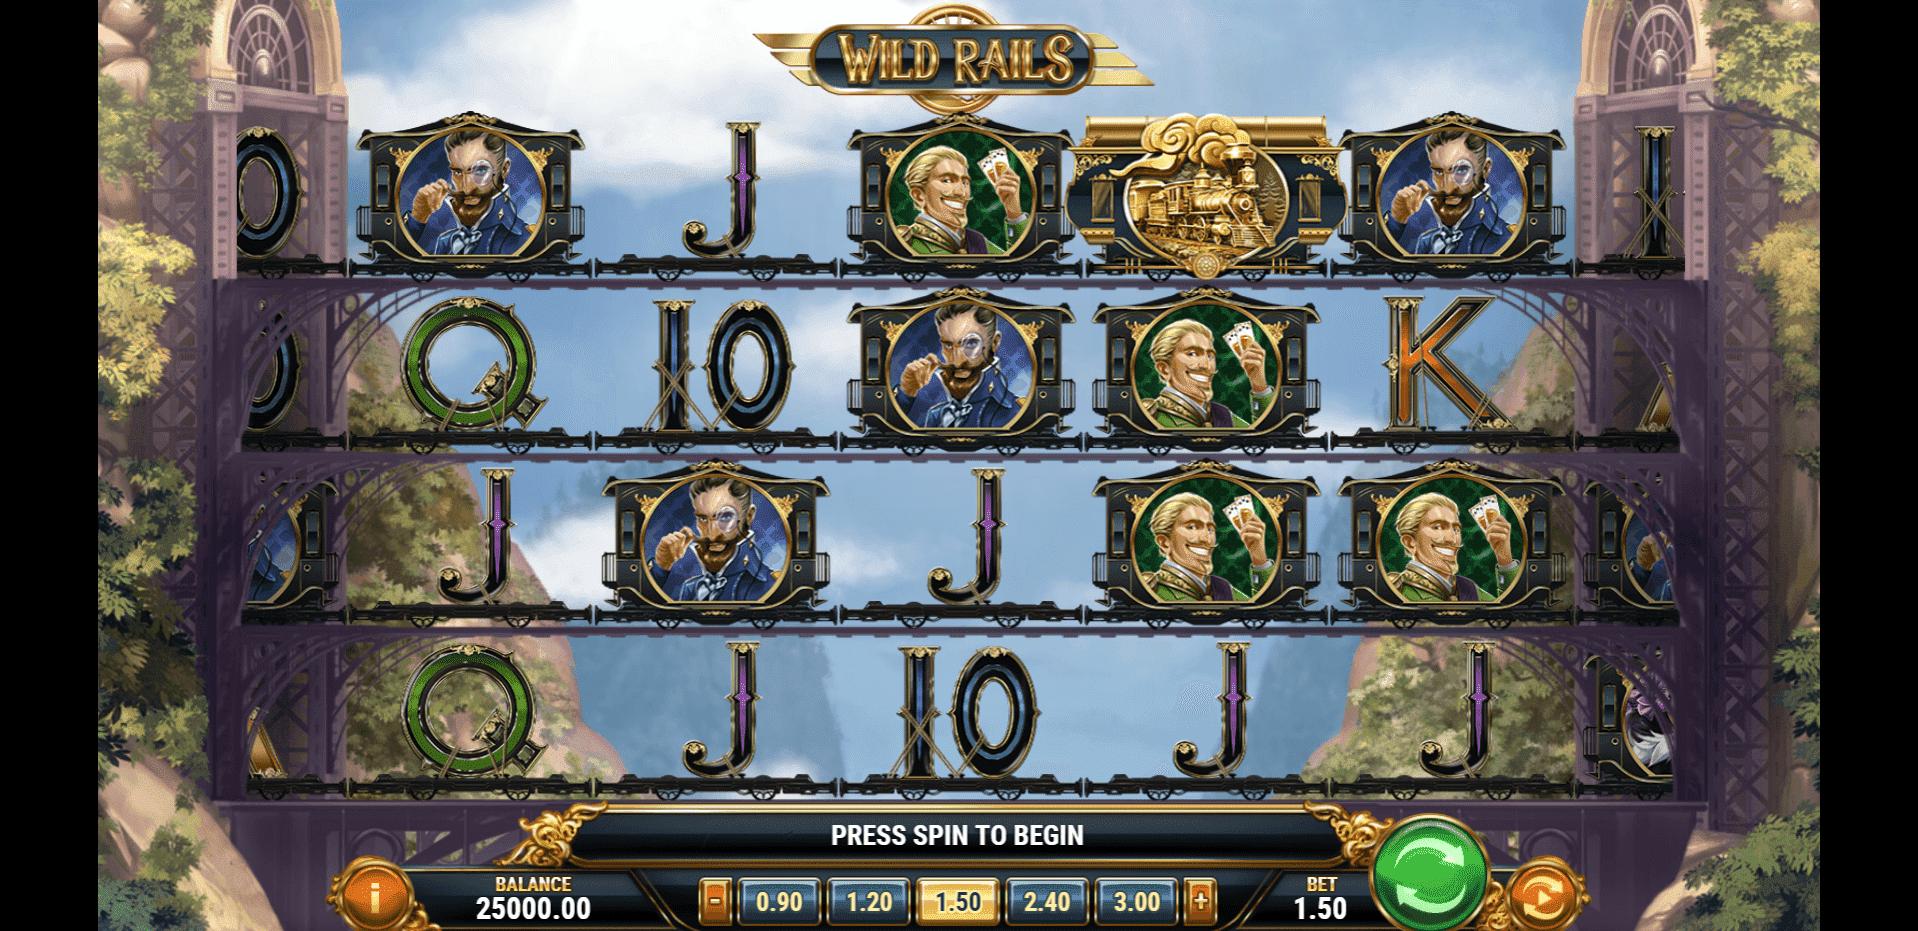 Wild Rails slot machine screenshot